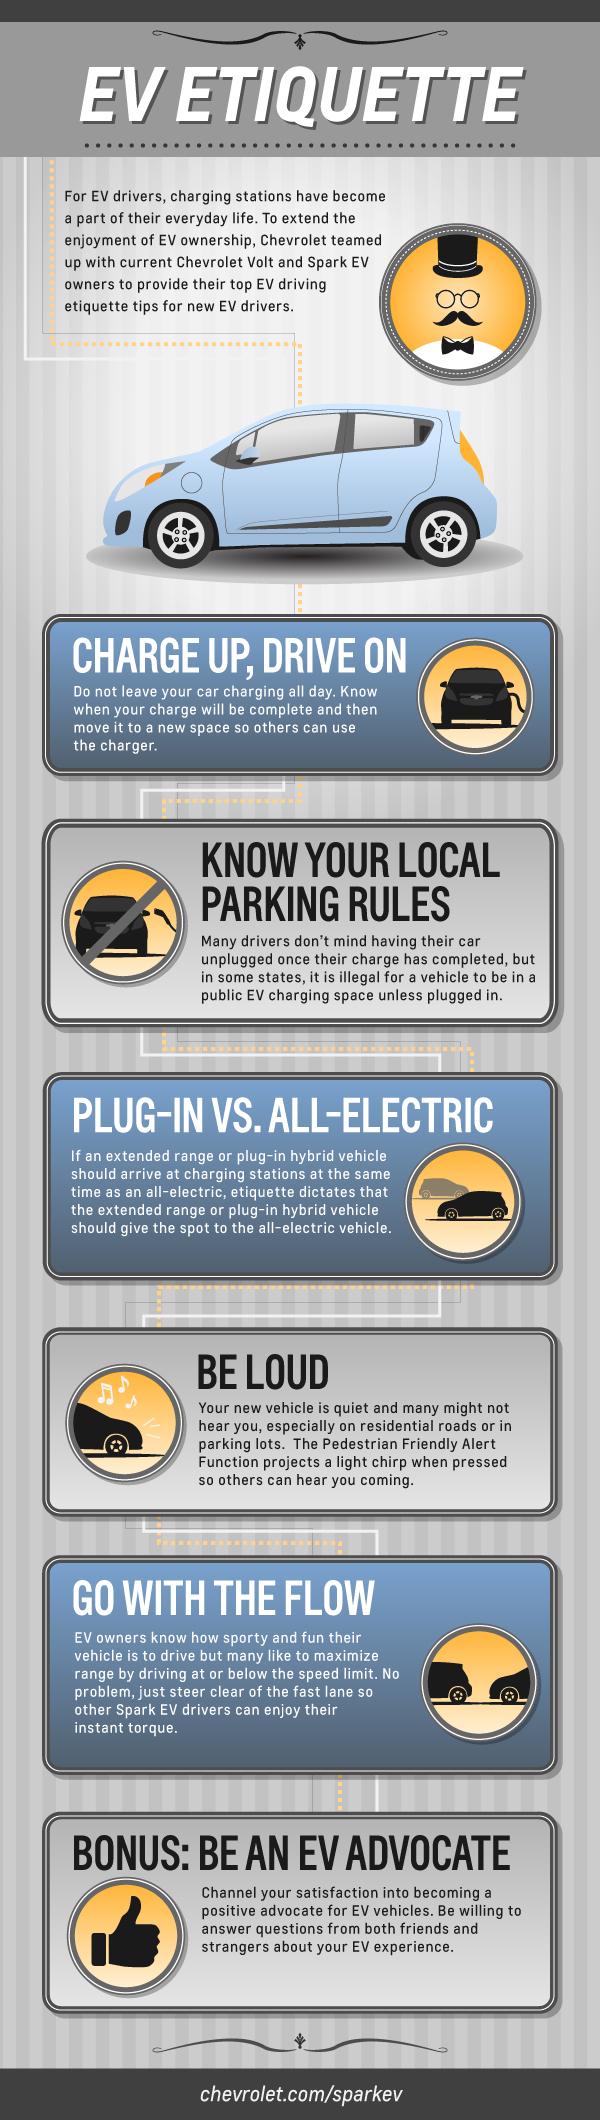 EV Etiquette infographic for 2014 Chevrolet Spark EV owners